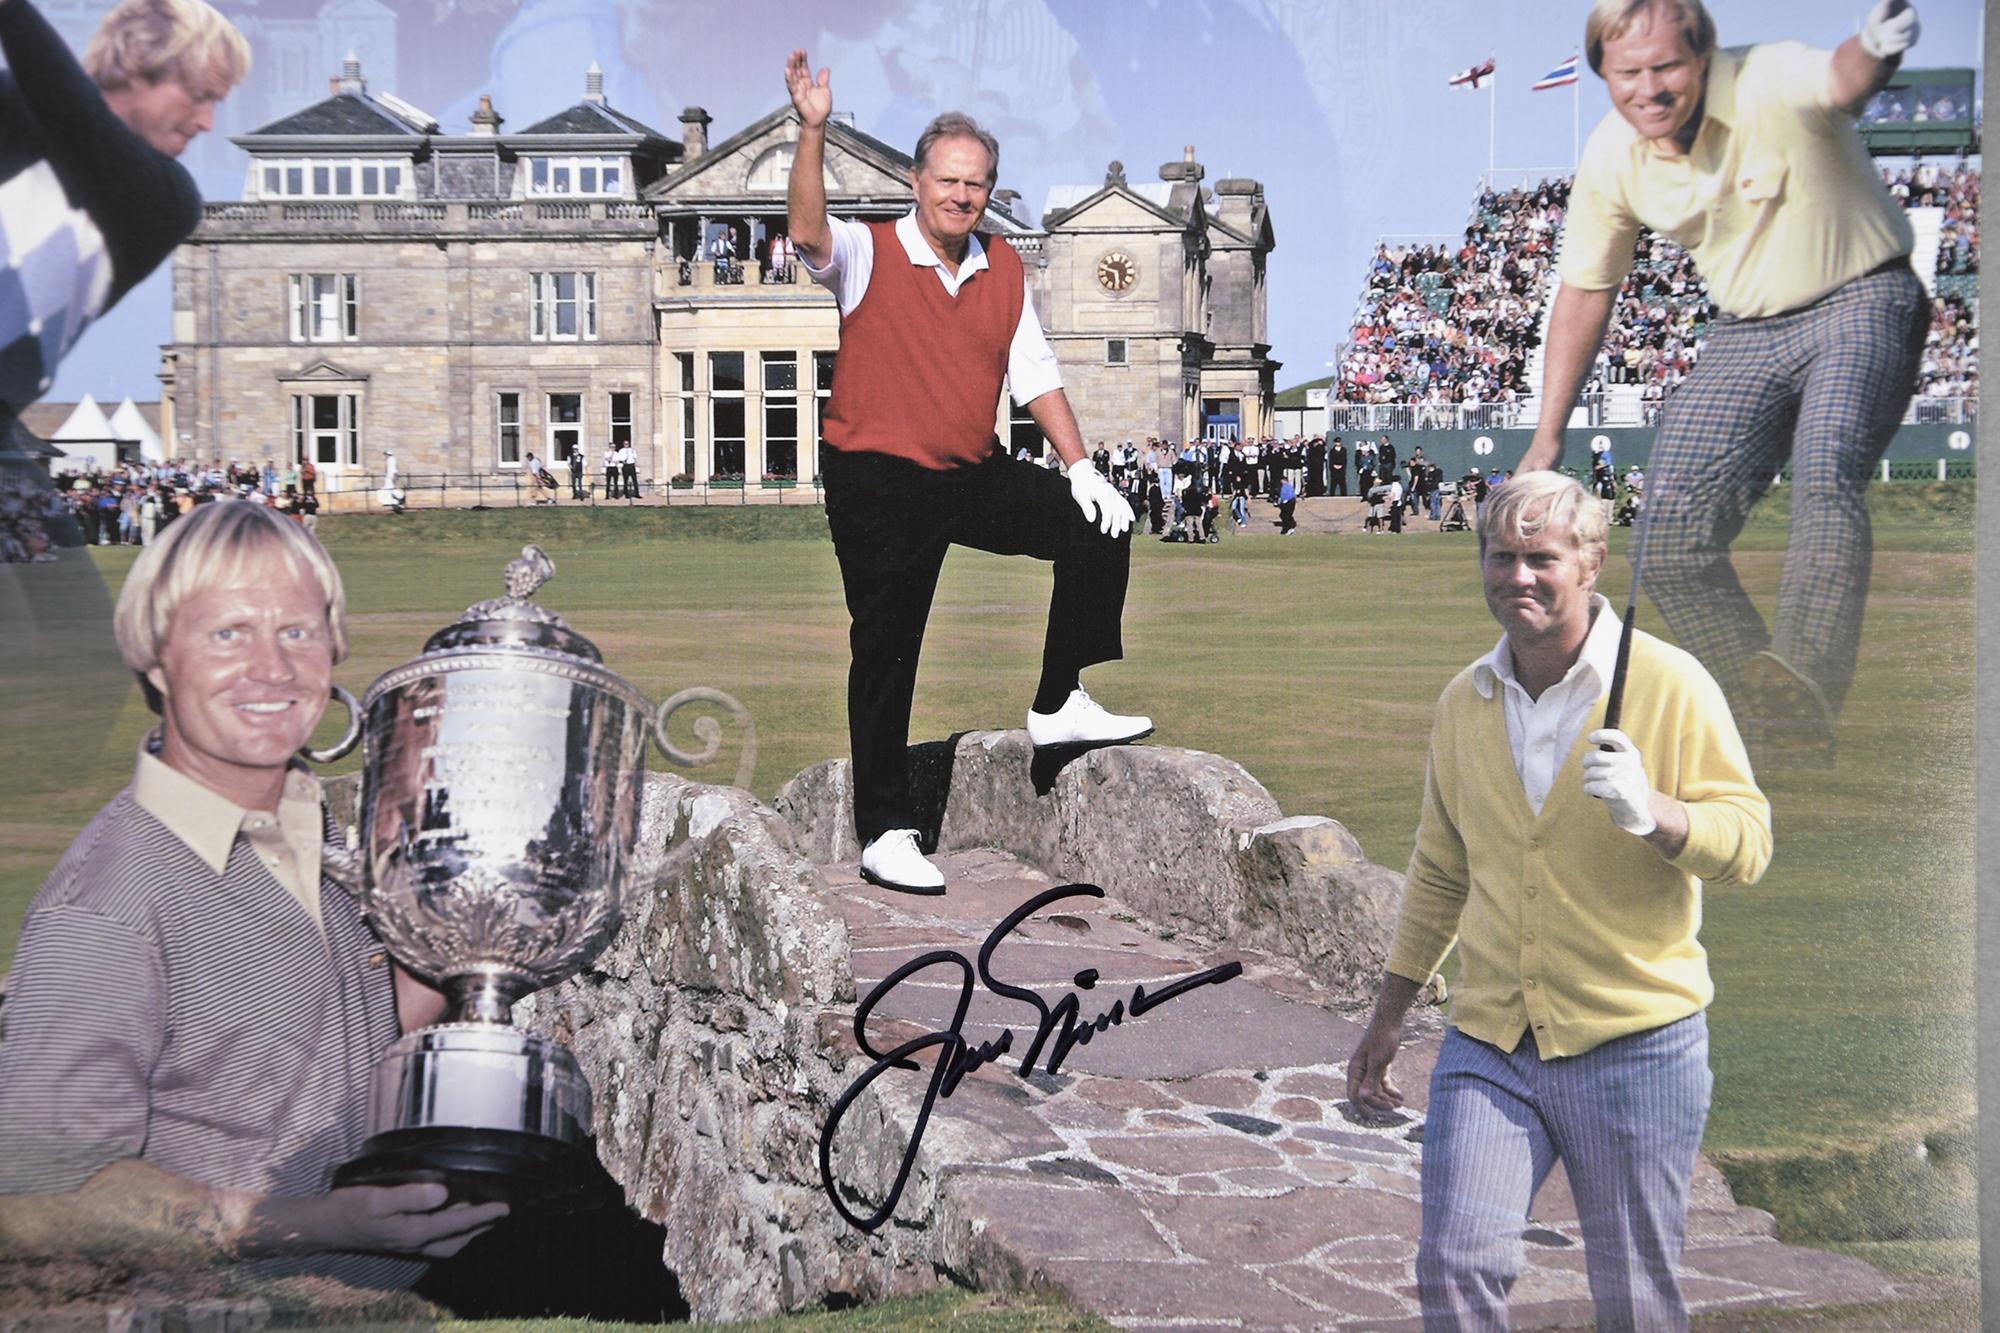 JACK NICKLAUS, GARY PLAYER & ARNOLD PALMER Original signatures.